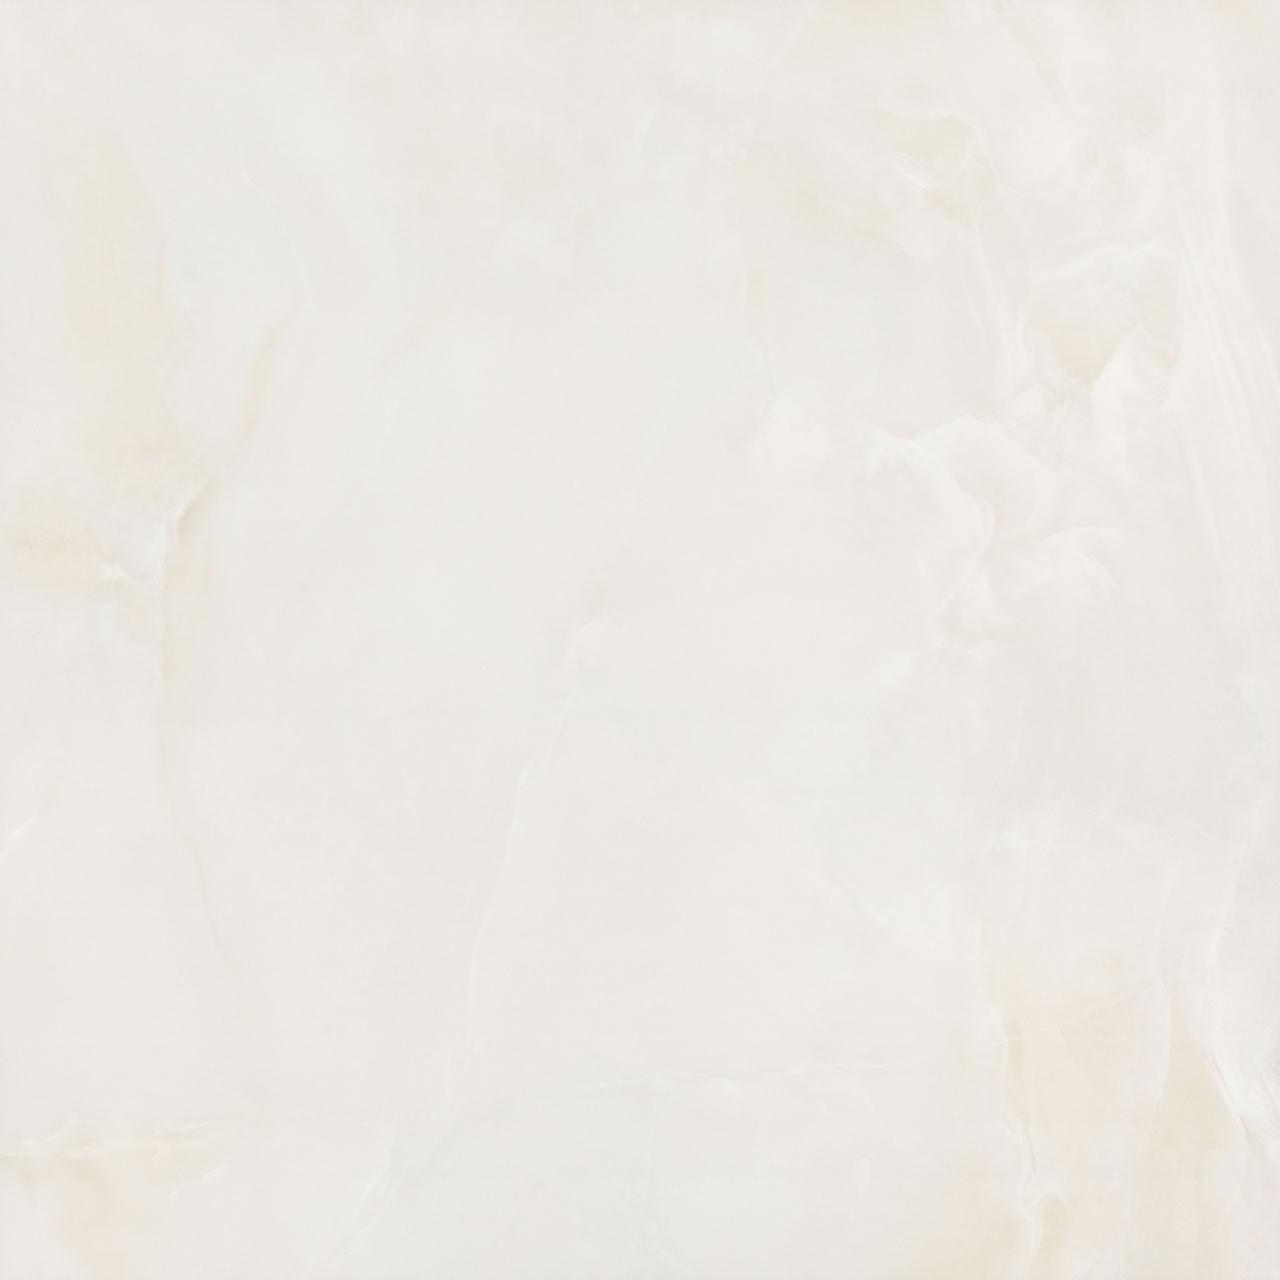 Porcelanato Onix Cristallo Bege 120x120 cm Esmaltado Polido 288m - Eliane